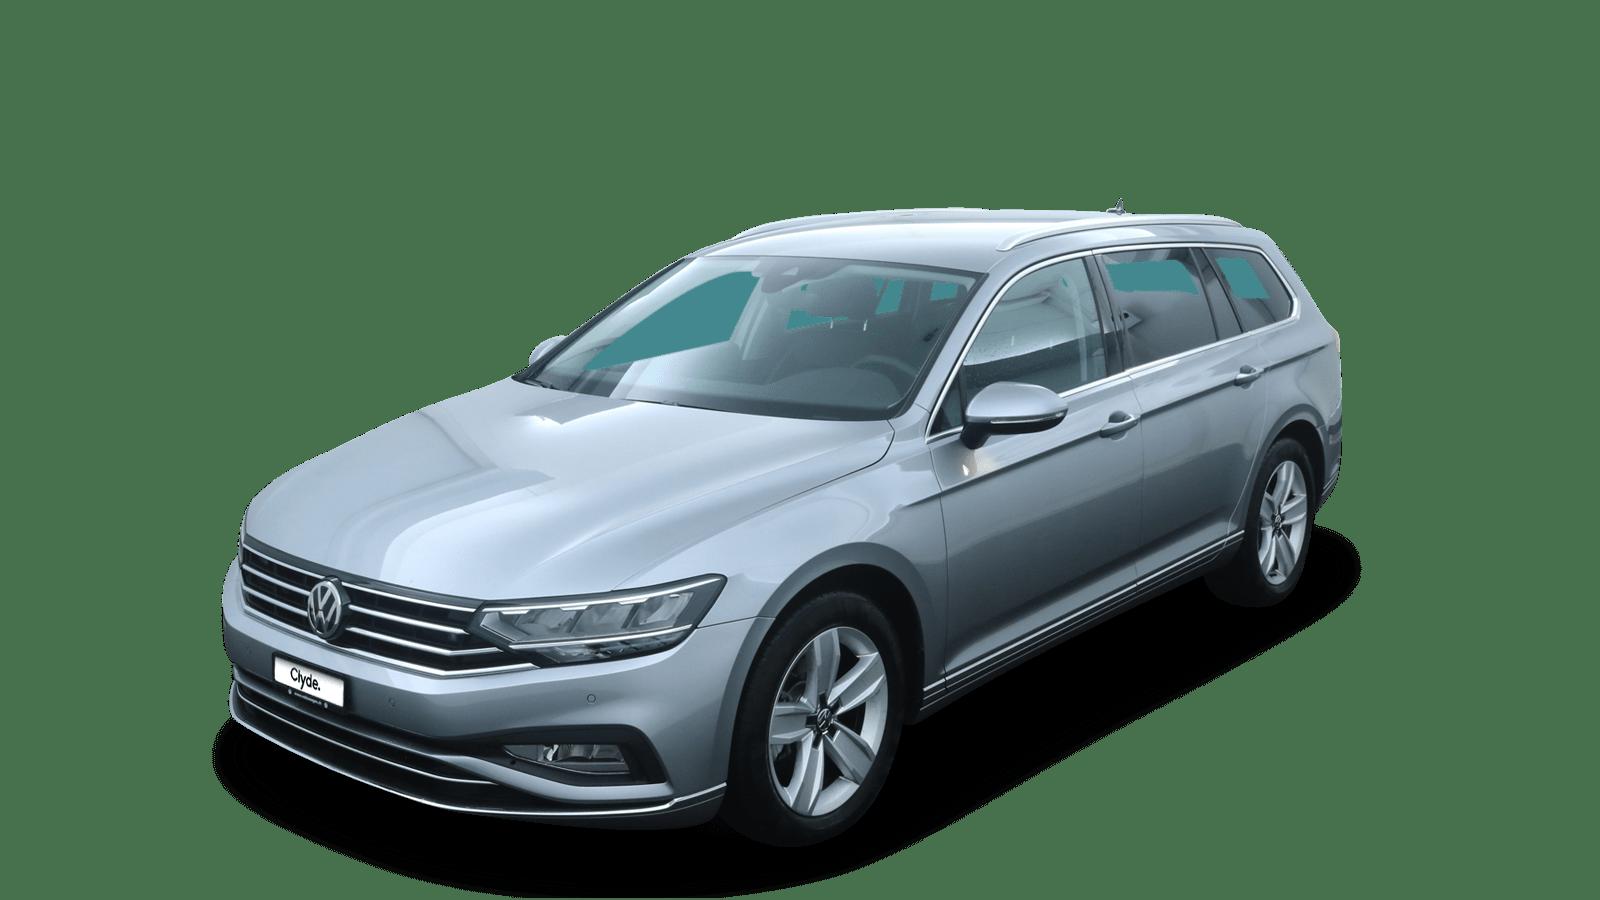 VW Passat Variant Silver front - Clyde car subscription